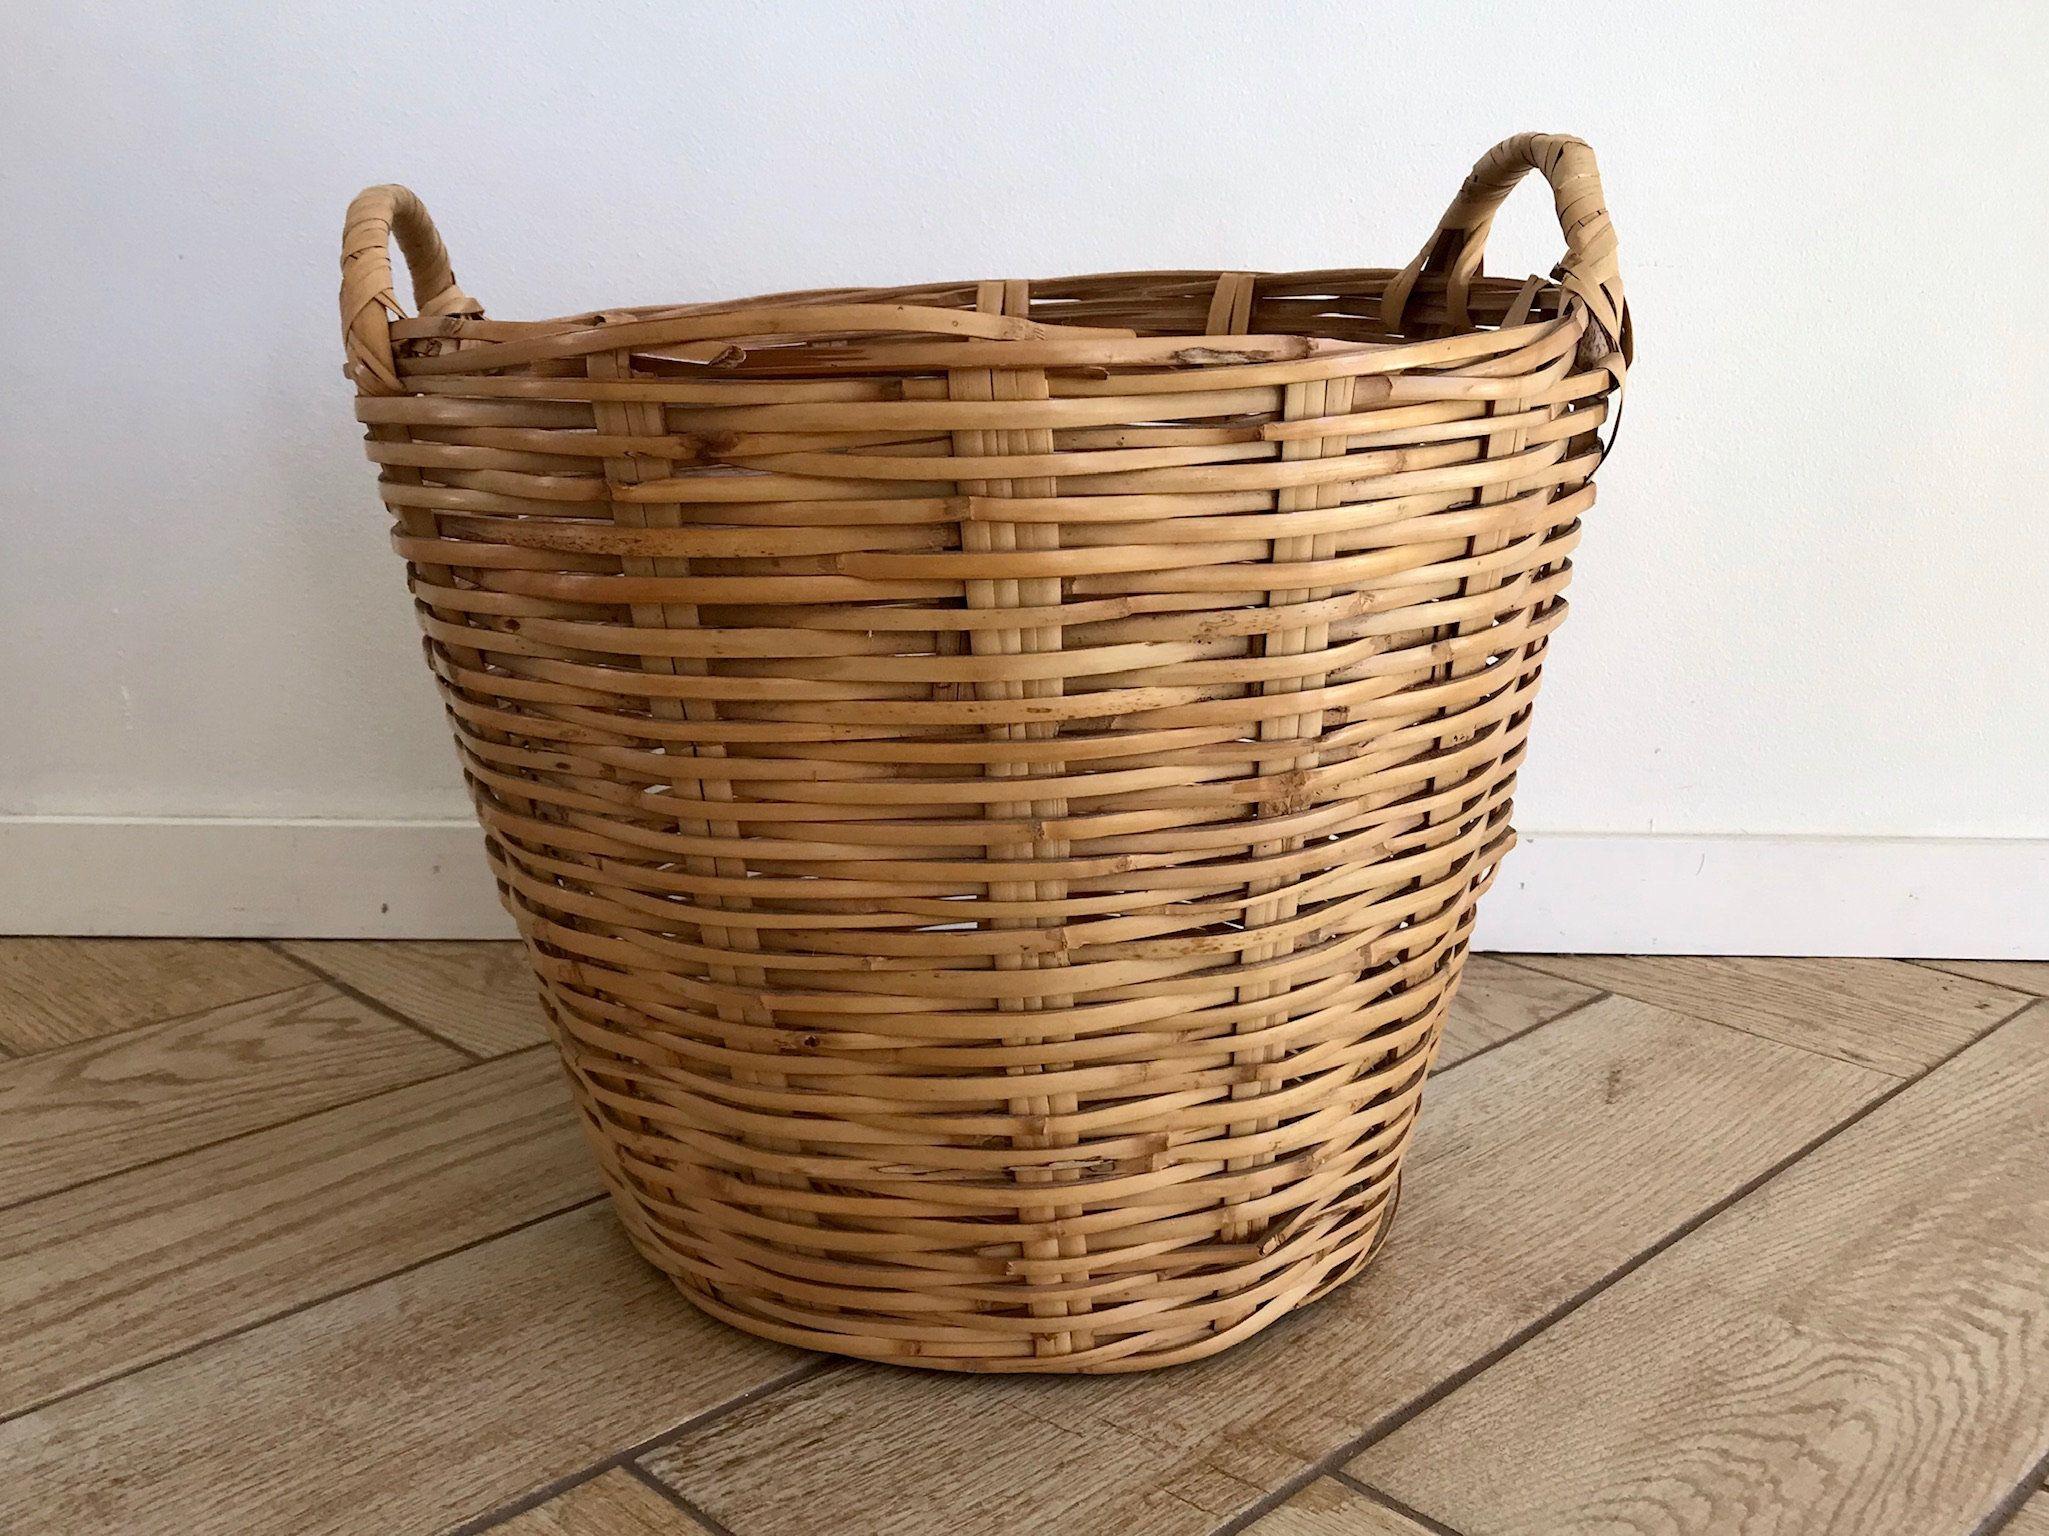 Medium Linen Basket Rattan Basket Wicker Laundry Basket